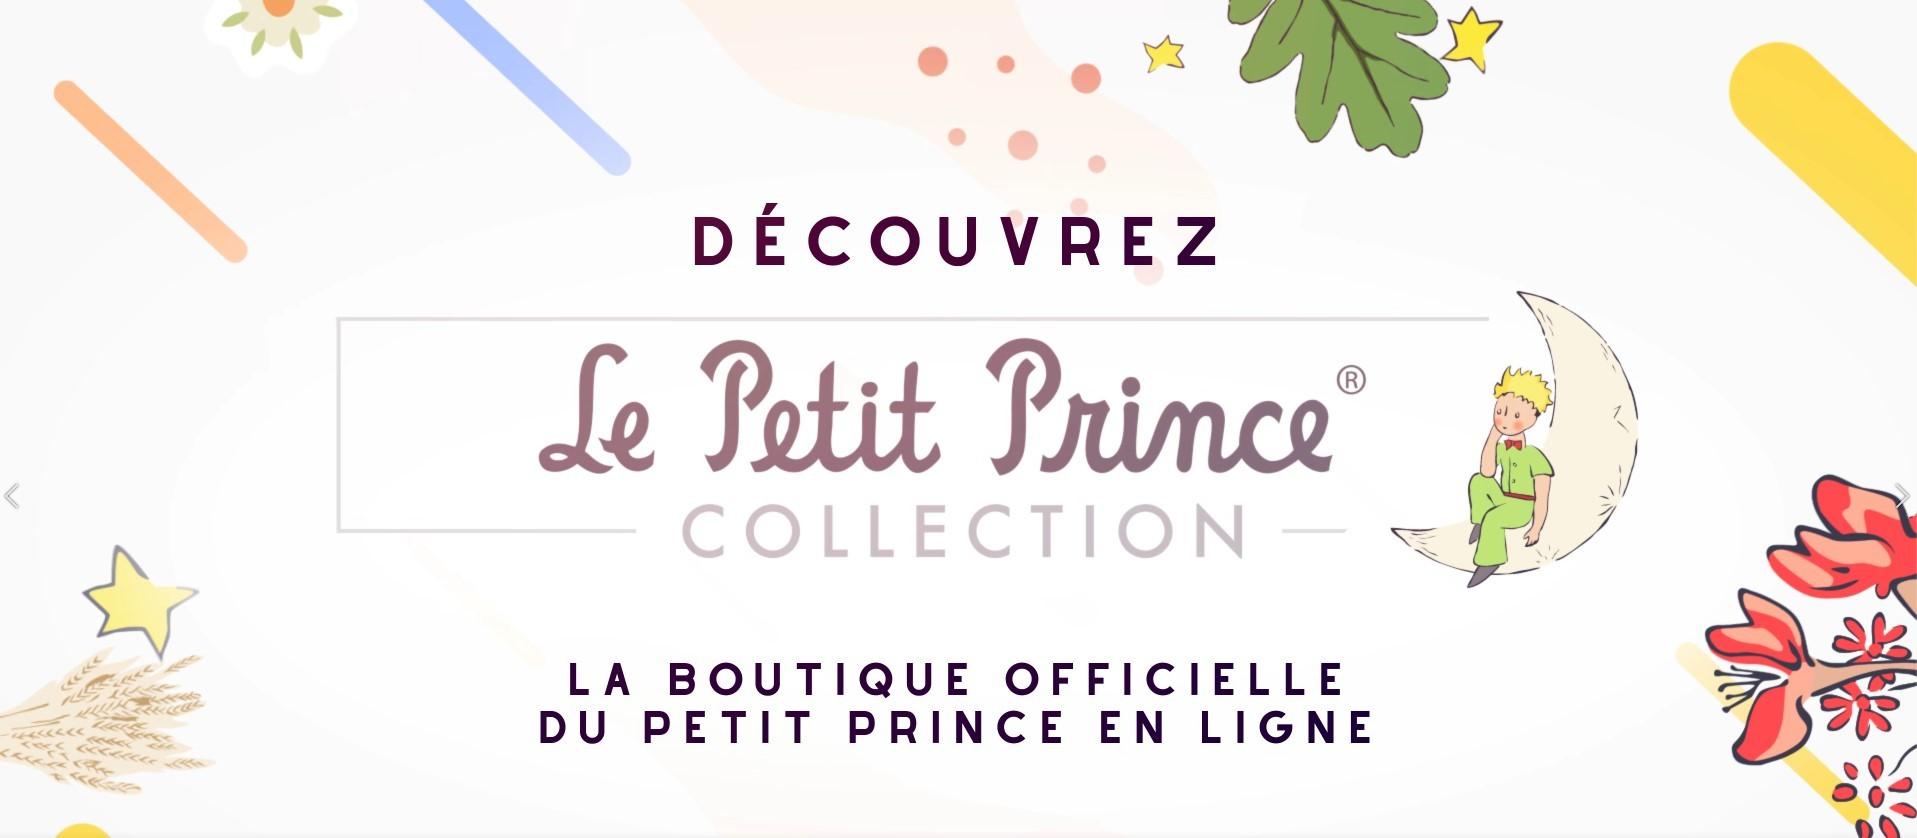 Le Petit Prince Collection lance sa chaîne YouTube !